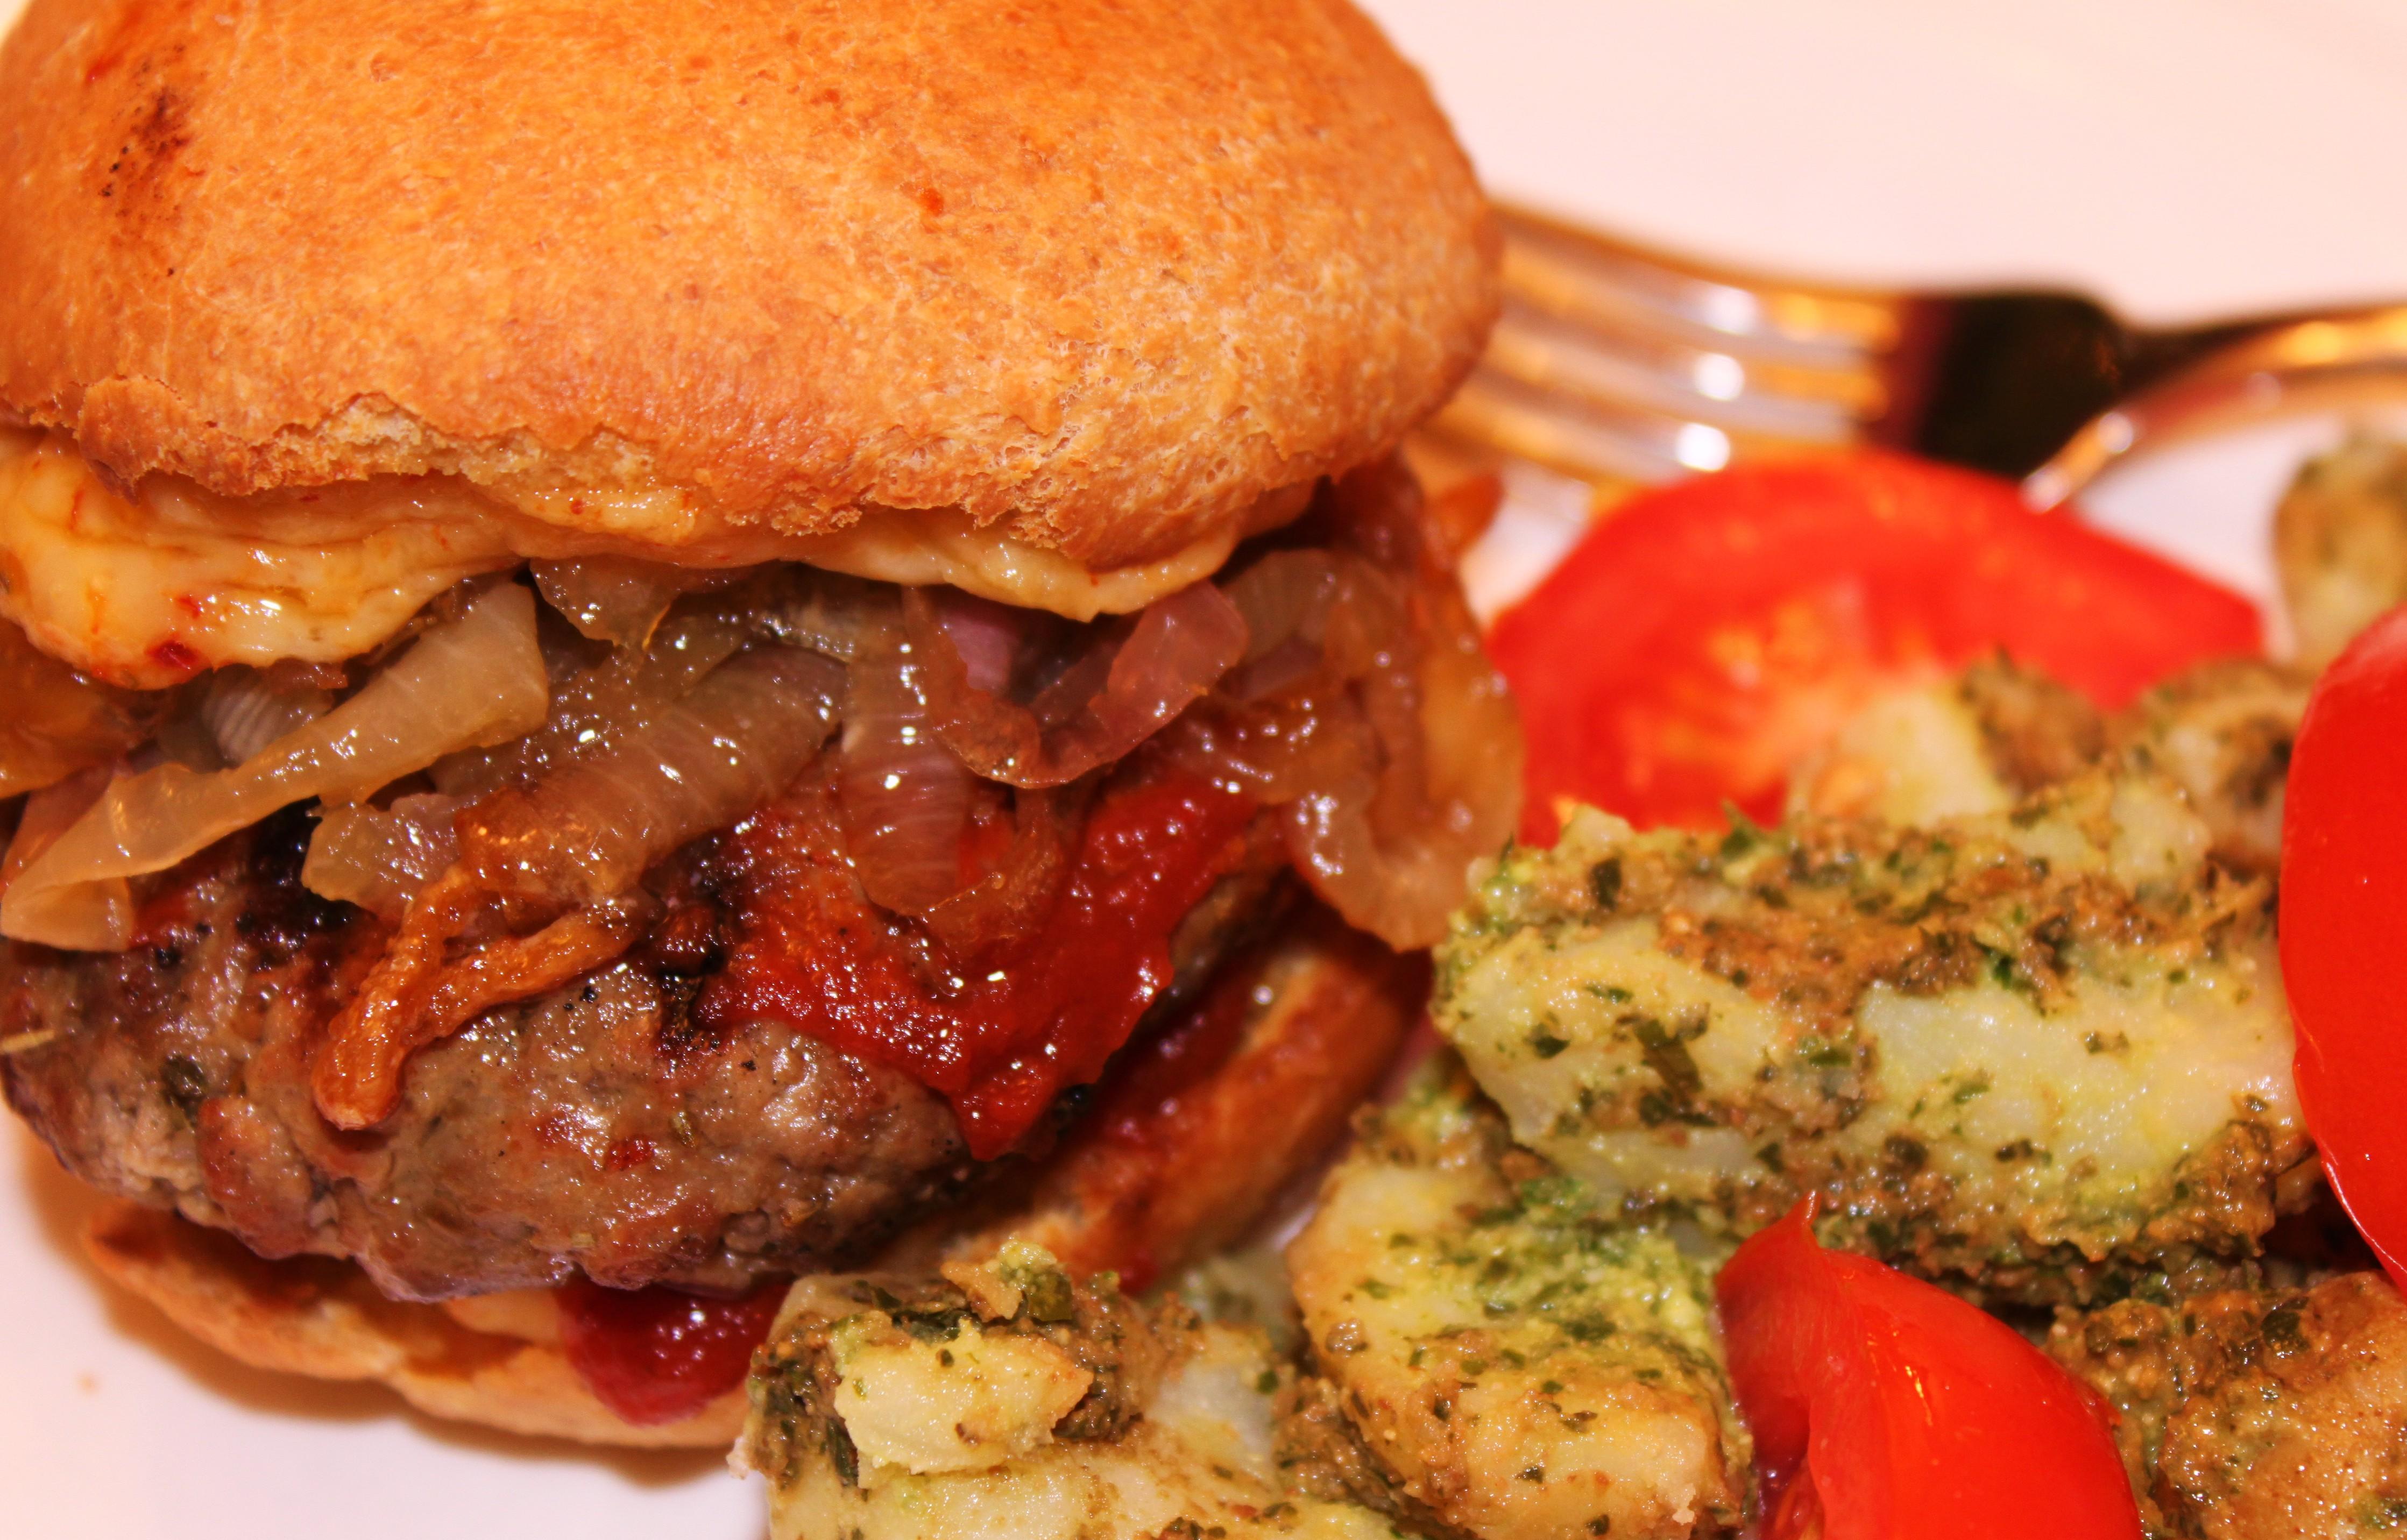 how to make homemade hamburgers with ground beef